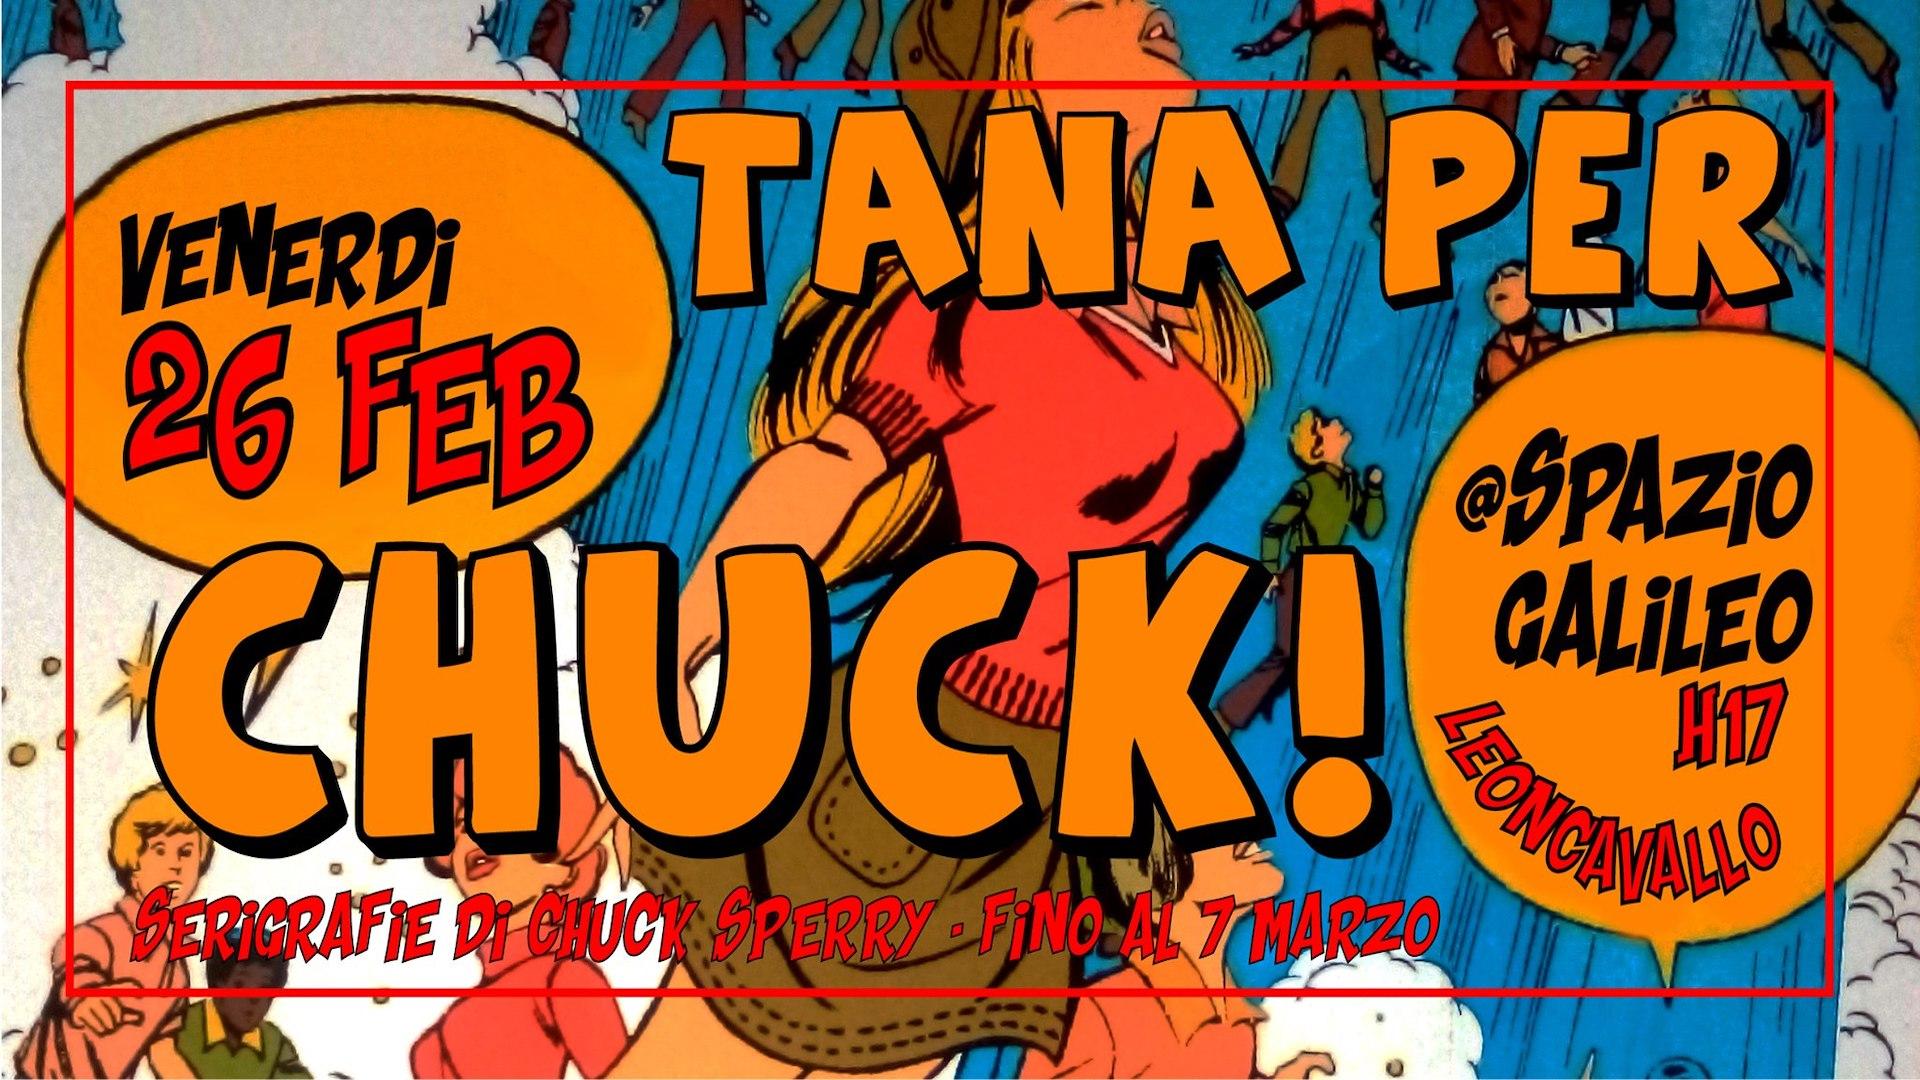 TANA PER CHUCK!